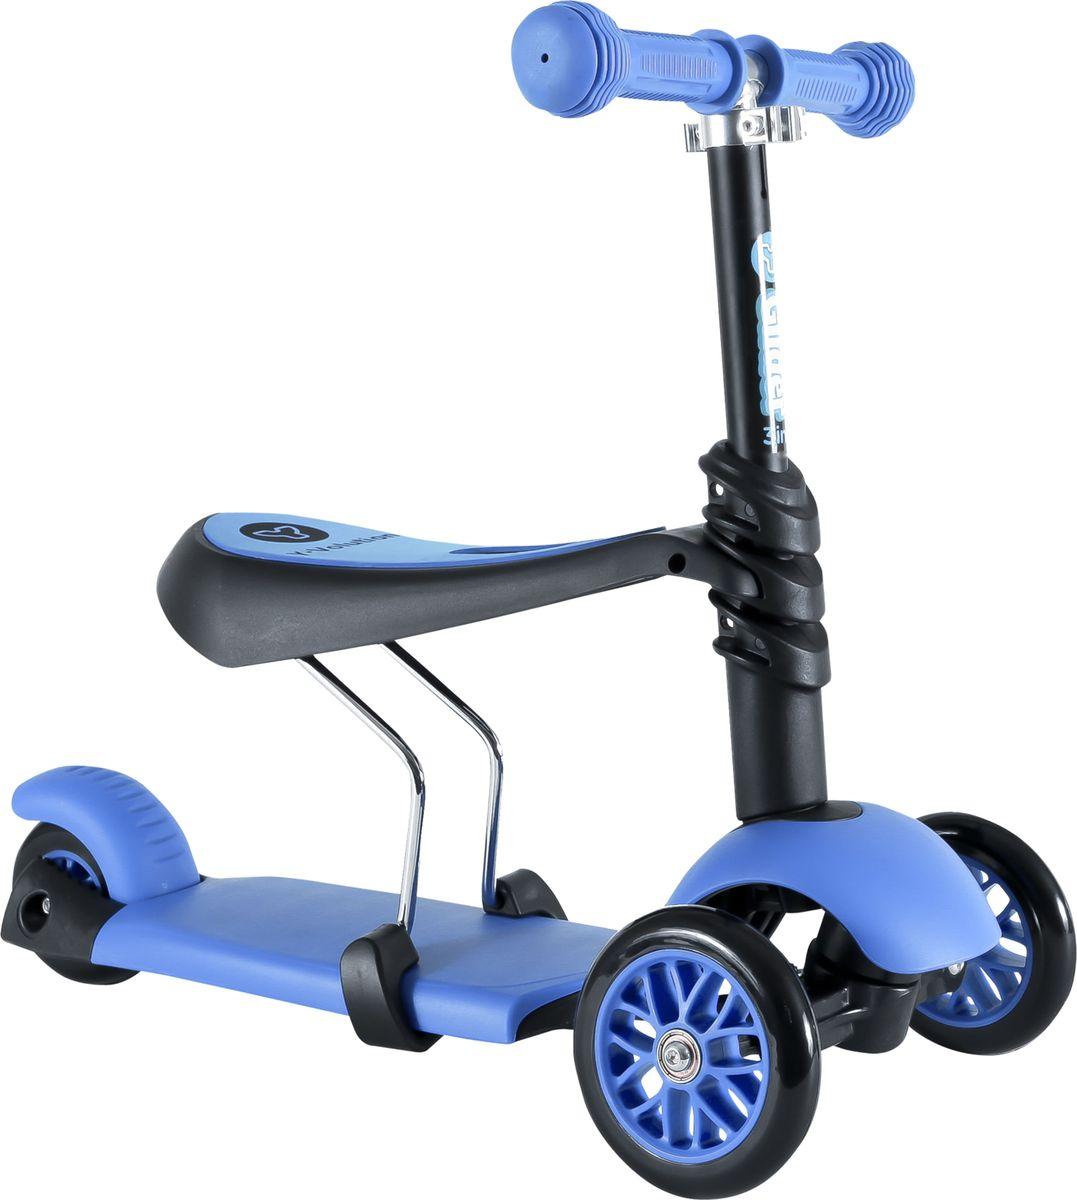 YVolution Самокат-беговел детский Glider 3 в 1 цвет синий